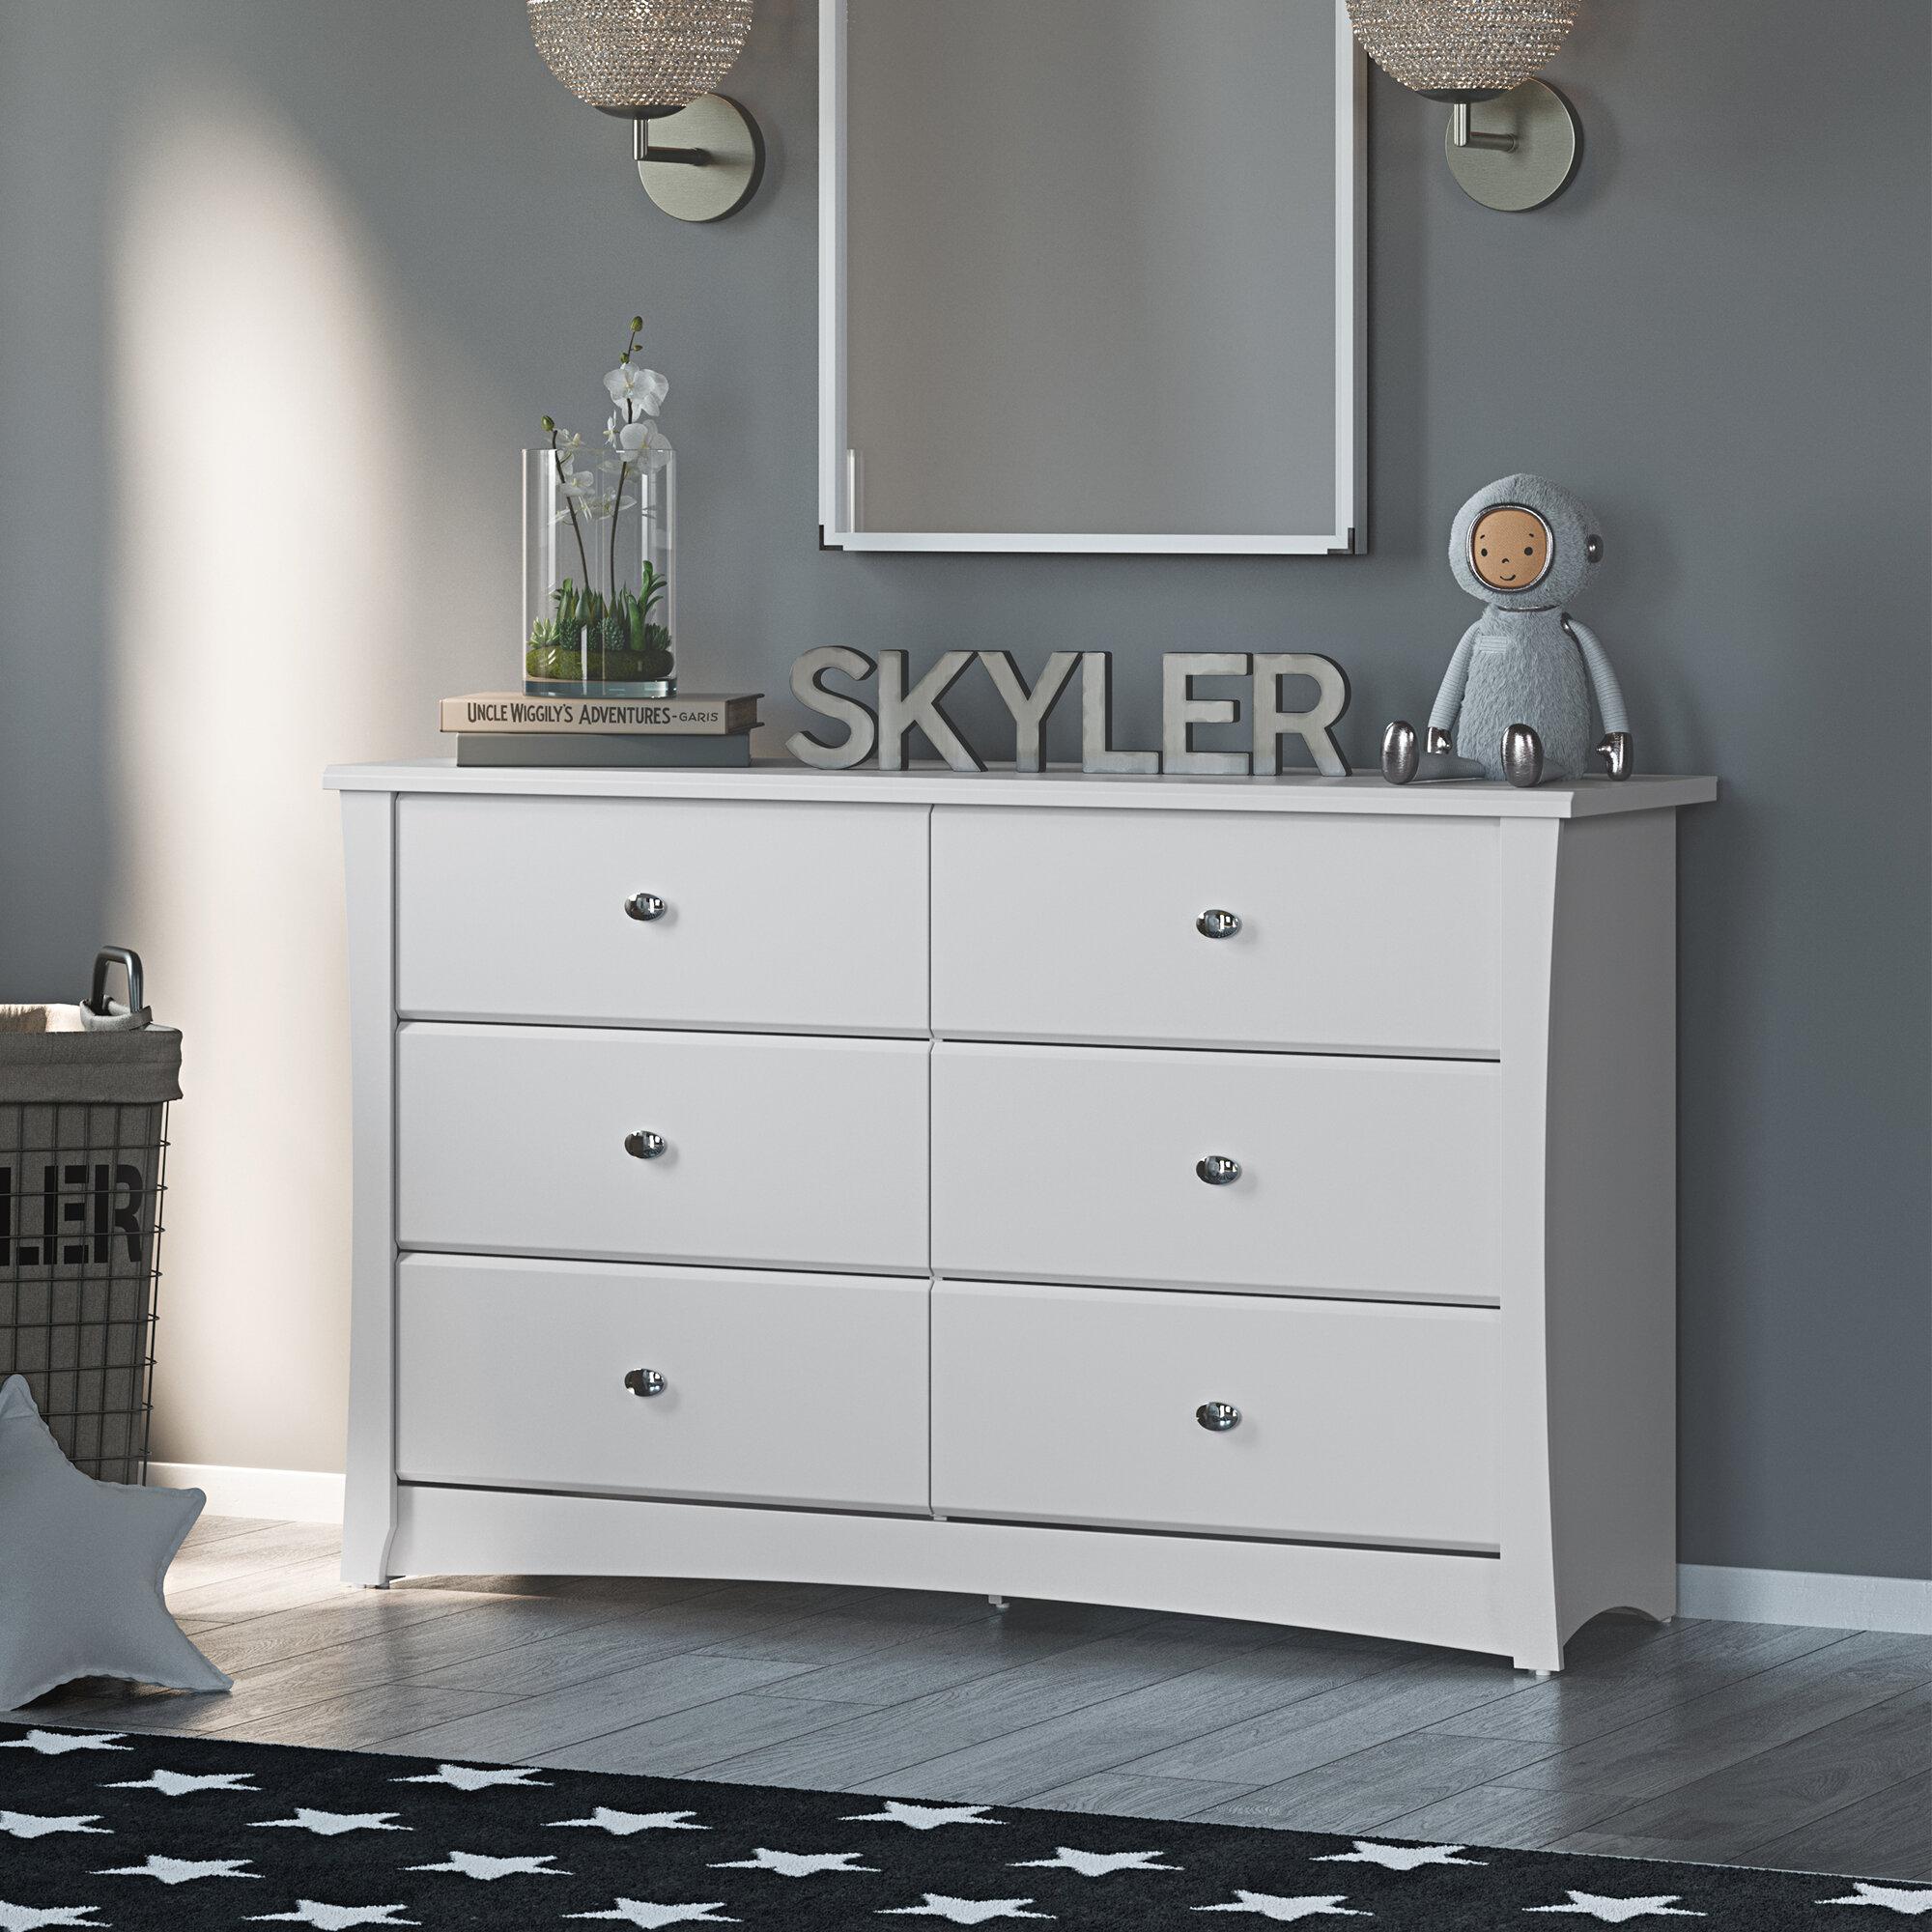 Kids Bedroom Dresser with 6 Drawers Pebble Gray Stork Craft Storkcraft Brookside 6 Drawer Dresser Ideal for Nursery Toddlers Room Kids Room Wood /& Composite Construction